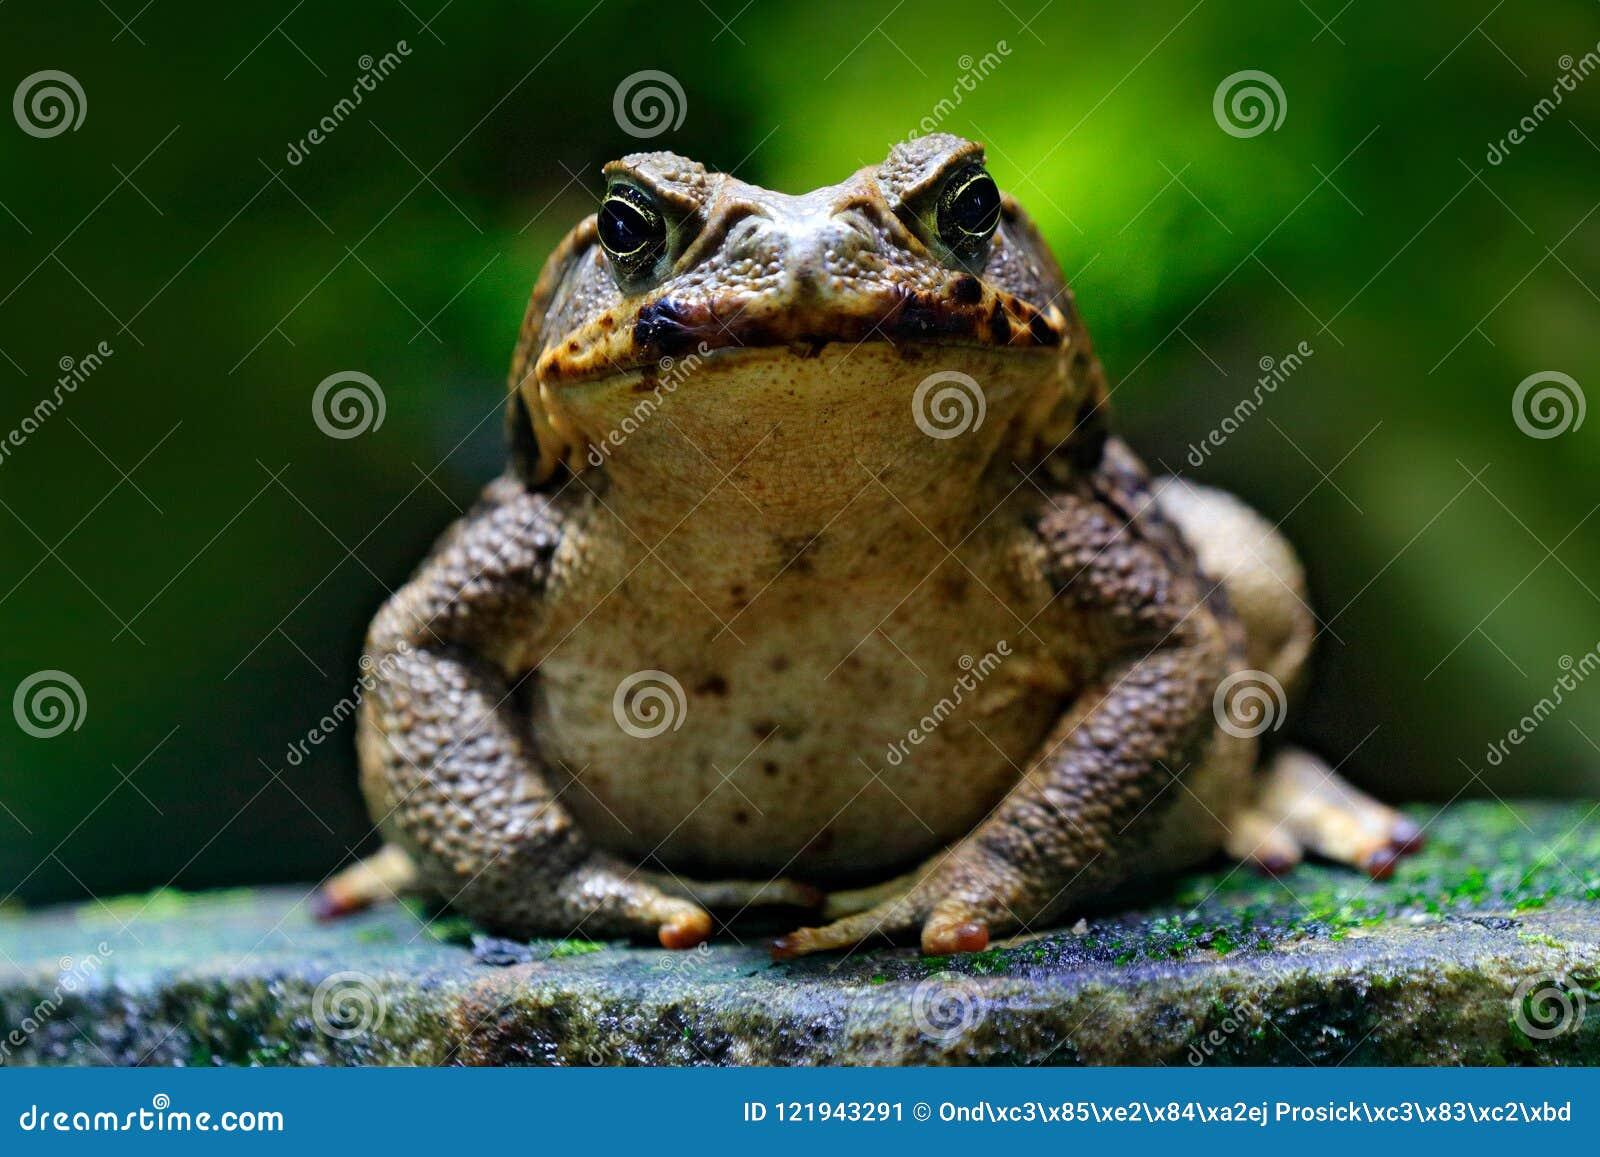 Crapaud de canne, marina de Rhinella, grande grenouille de Costa Rica Faites face au portrait du grand amphibie dans l habitat de